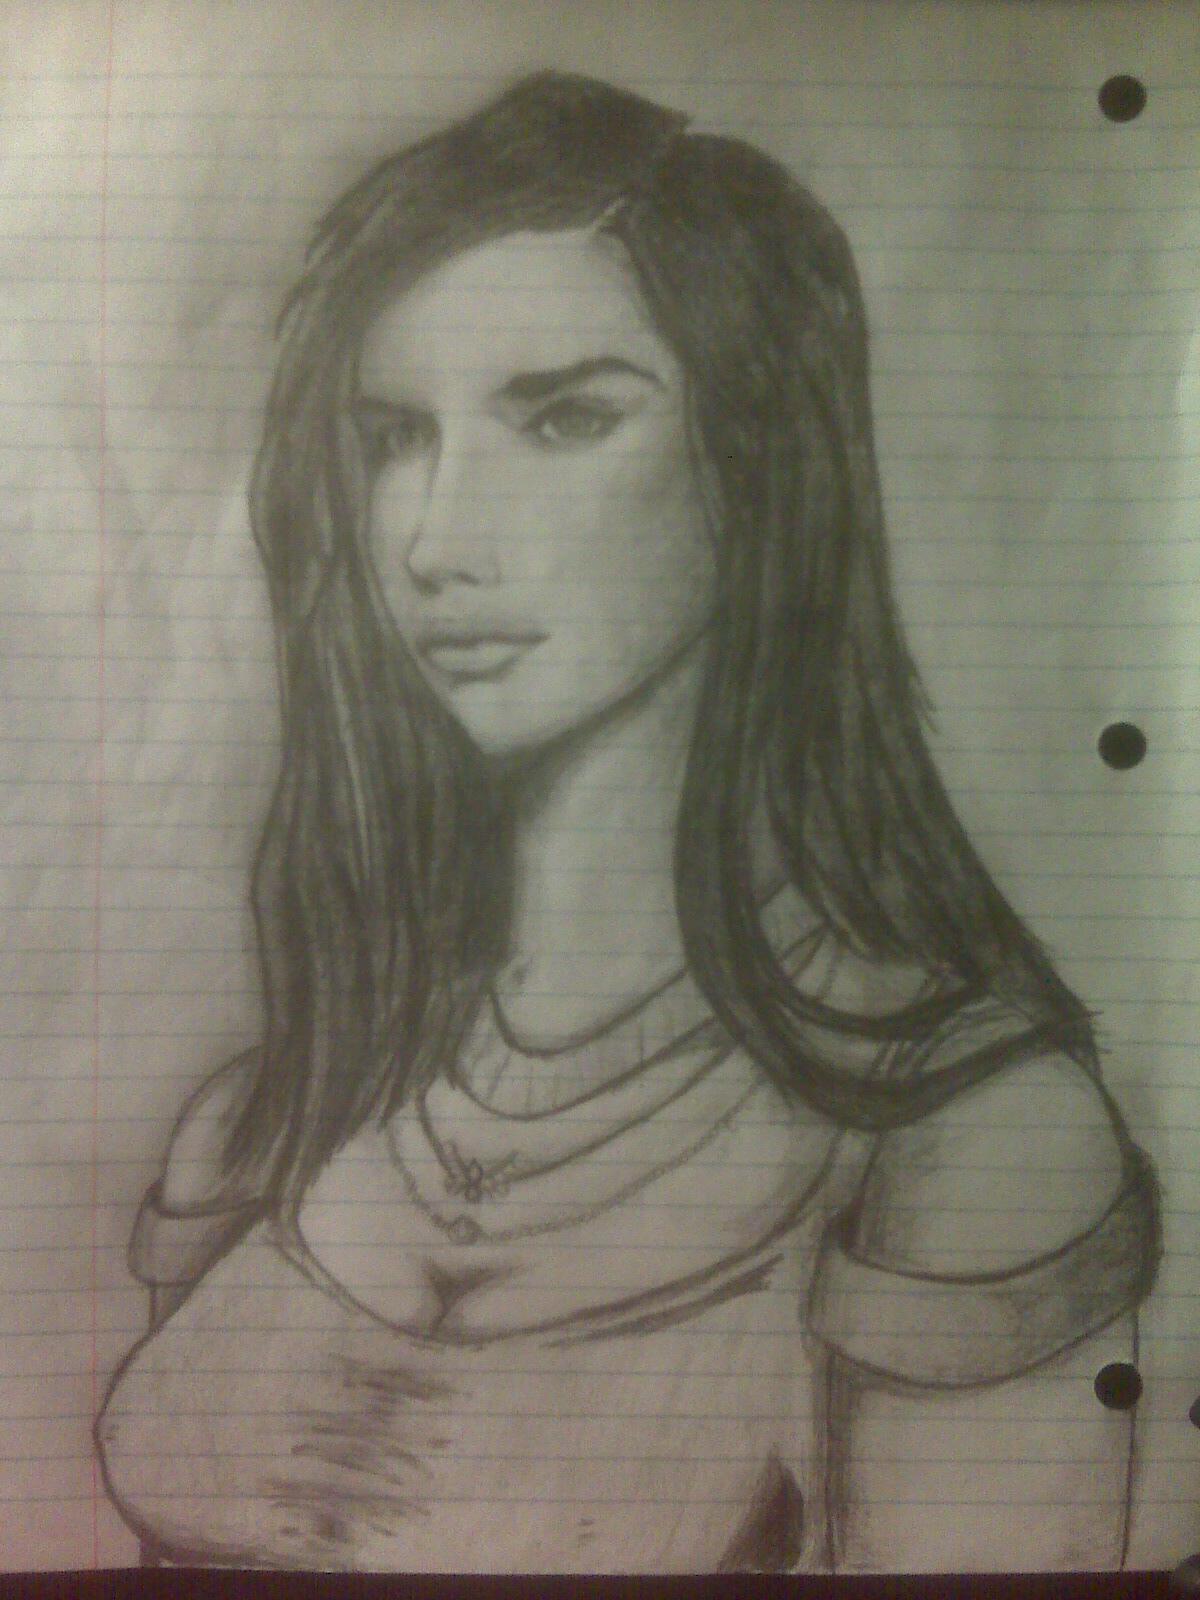 Veronika upper body pencil art